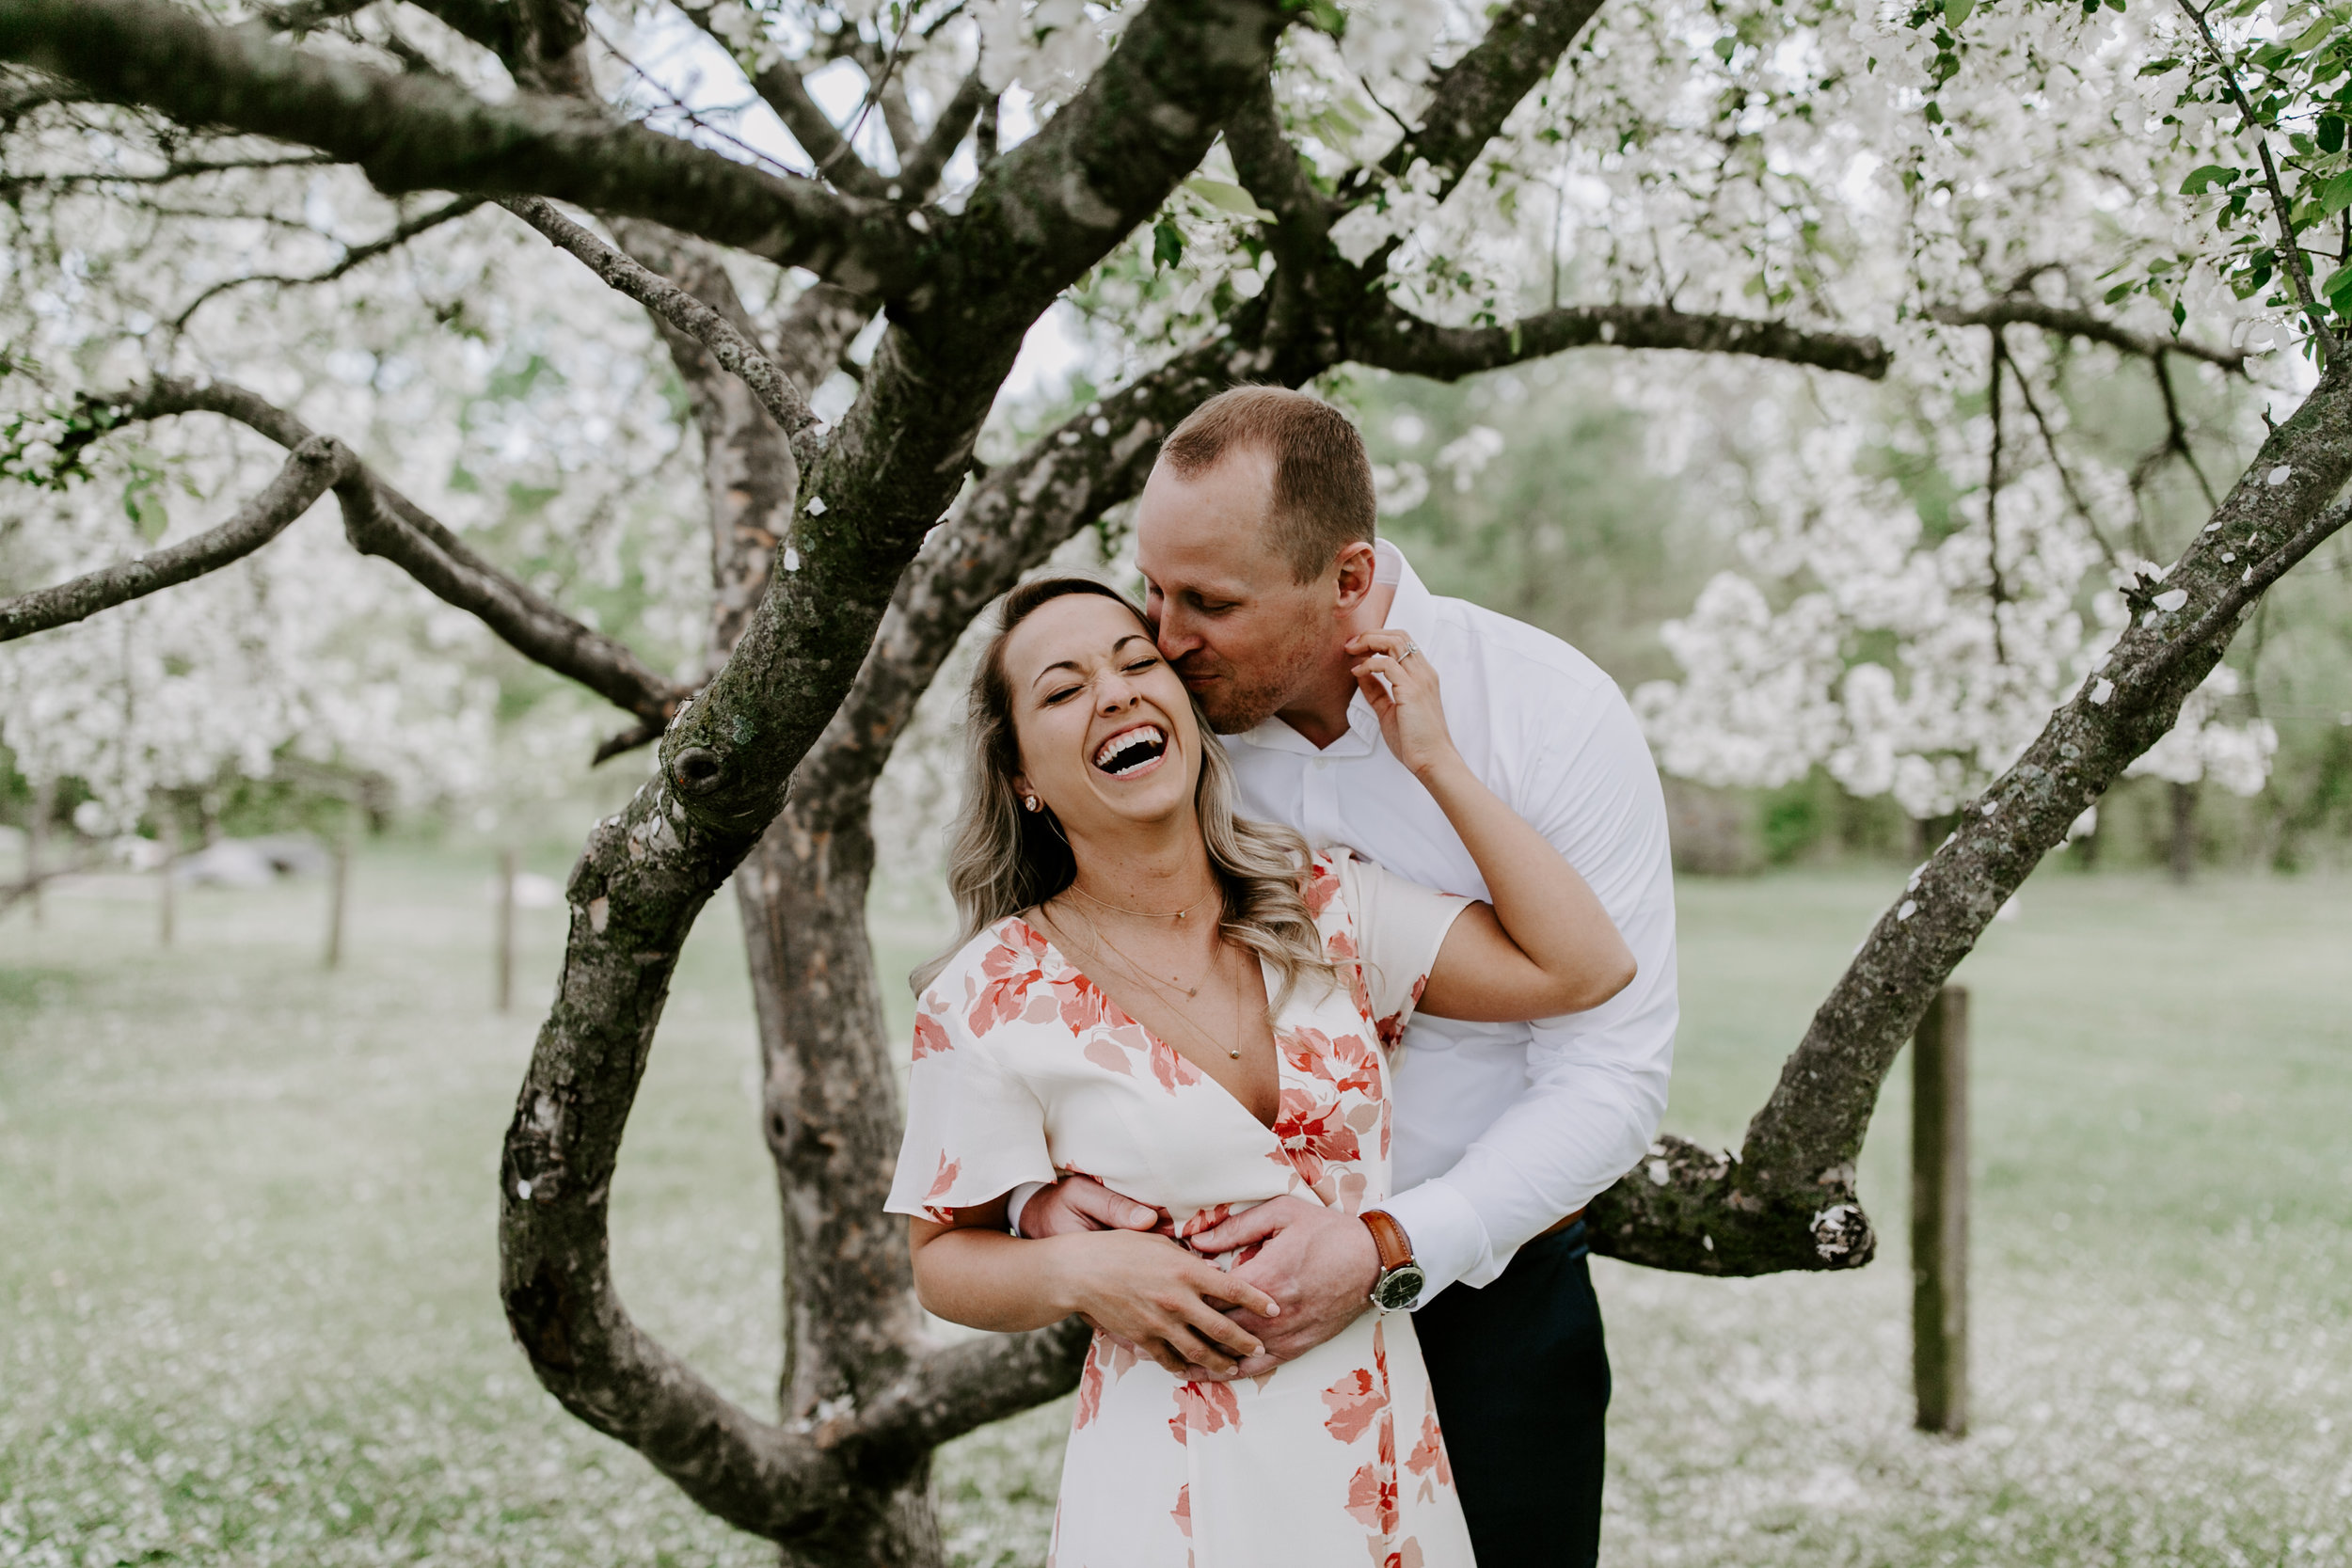 gracetphotography-wedding-photographer-adventure-bride-engagement-midwest-24.jpg